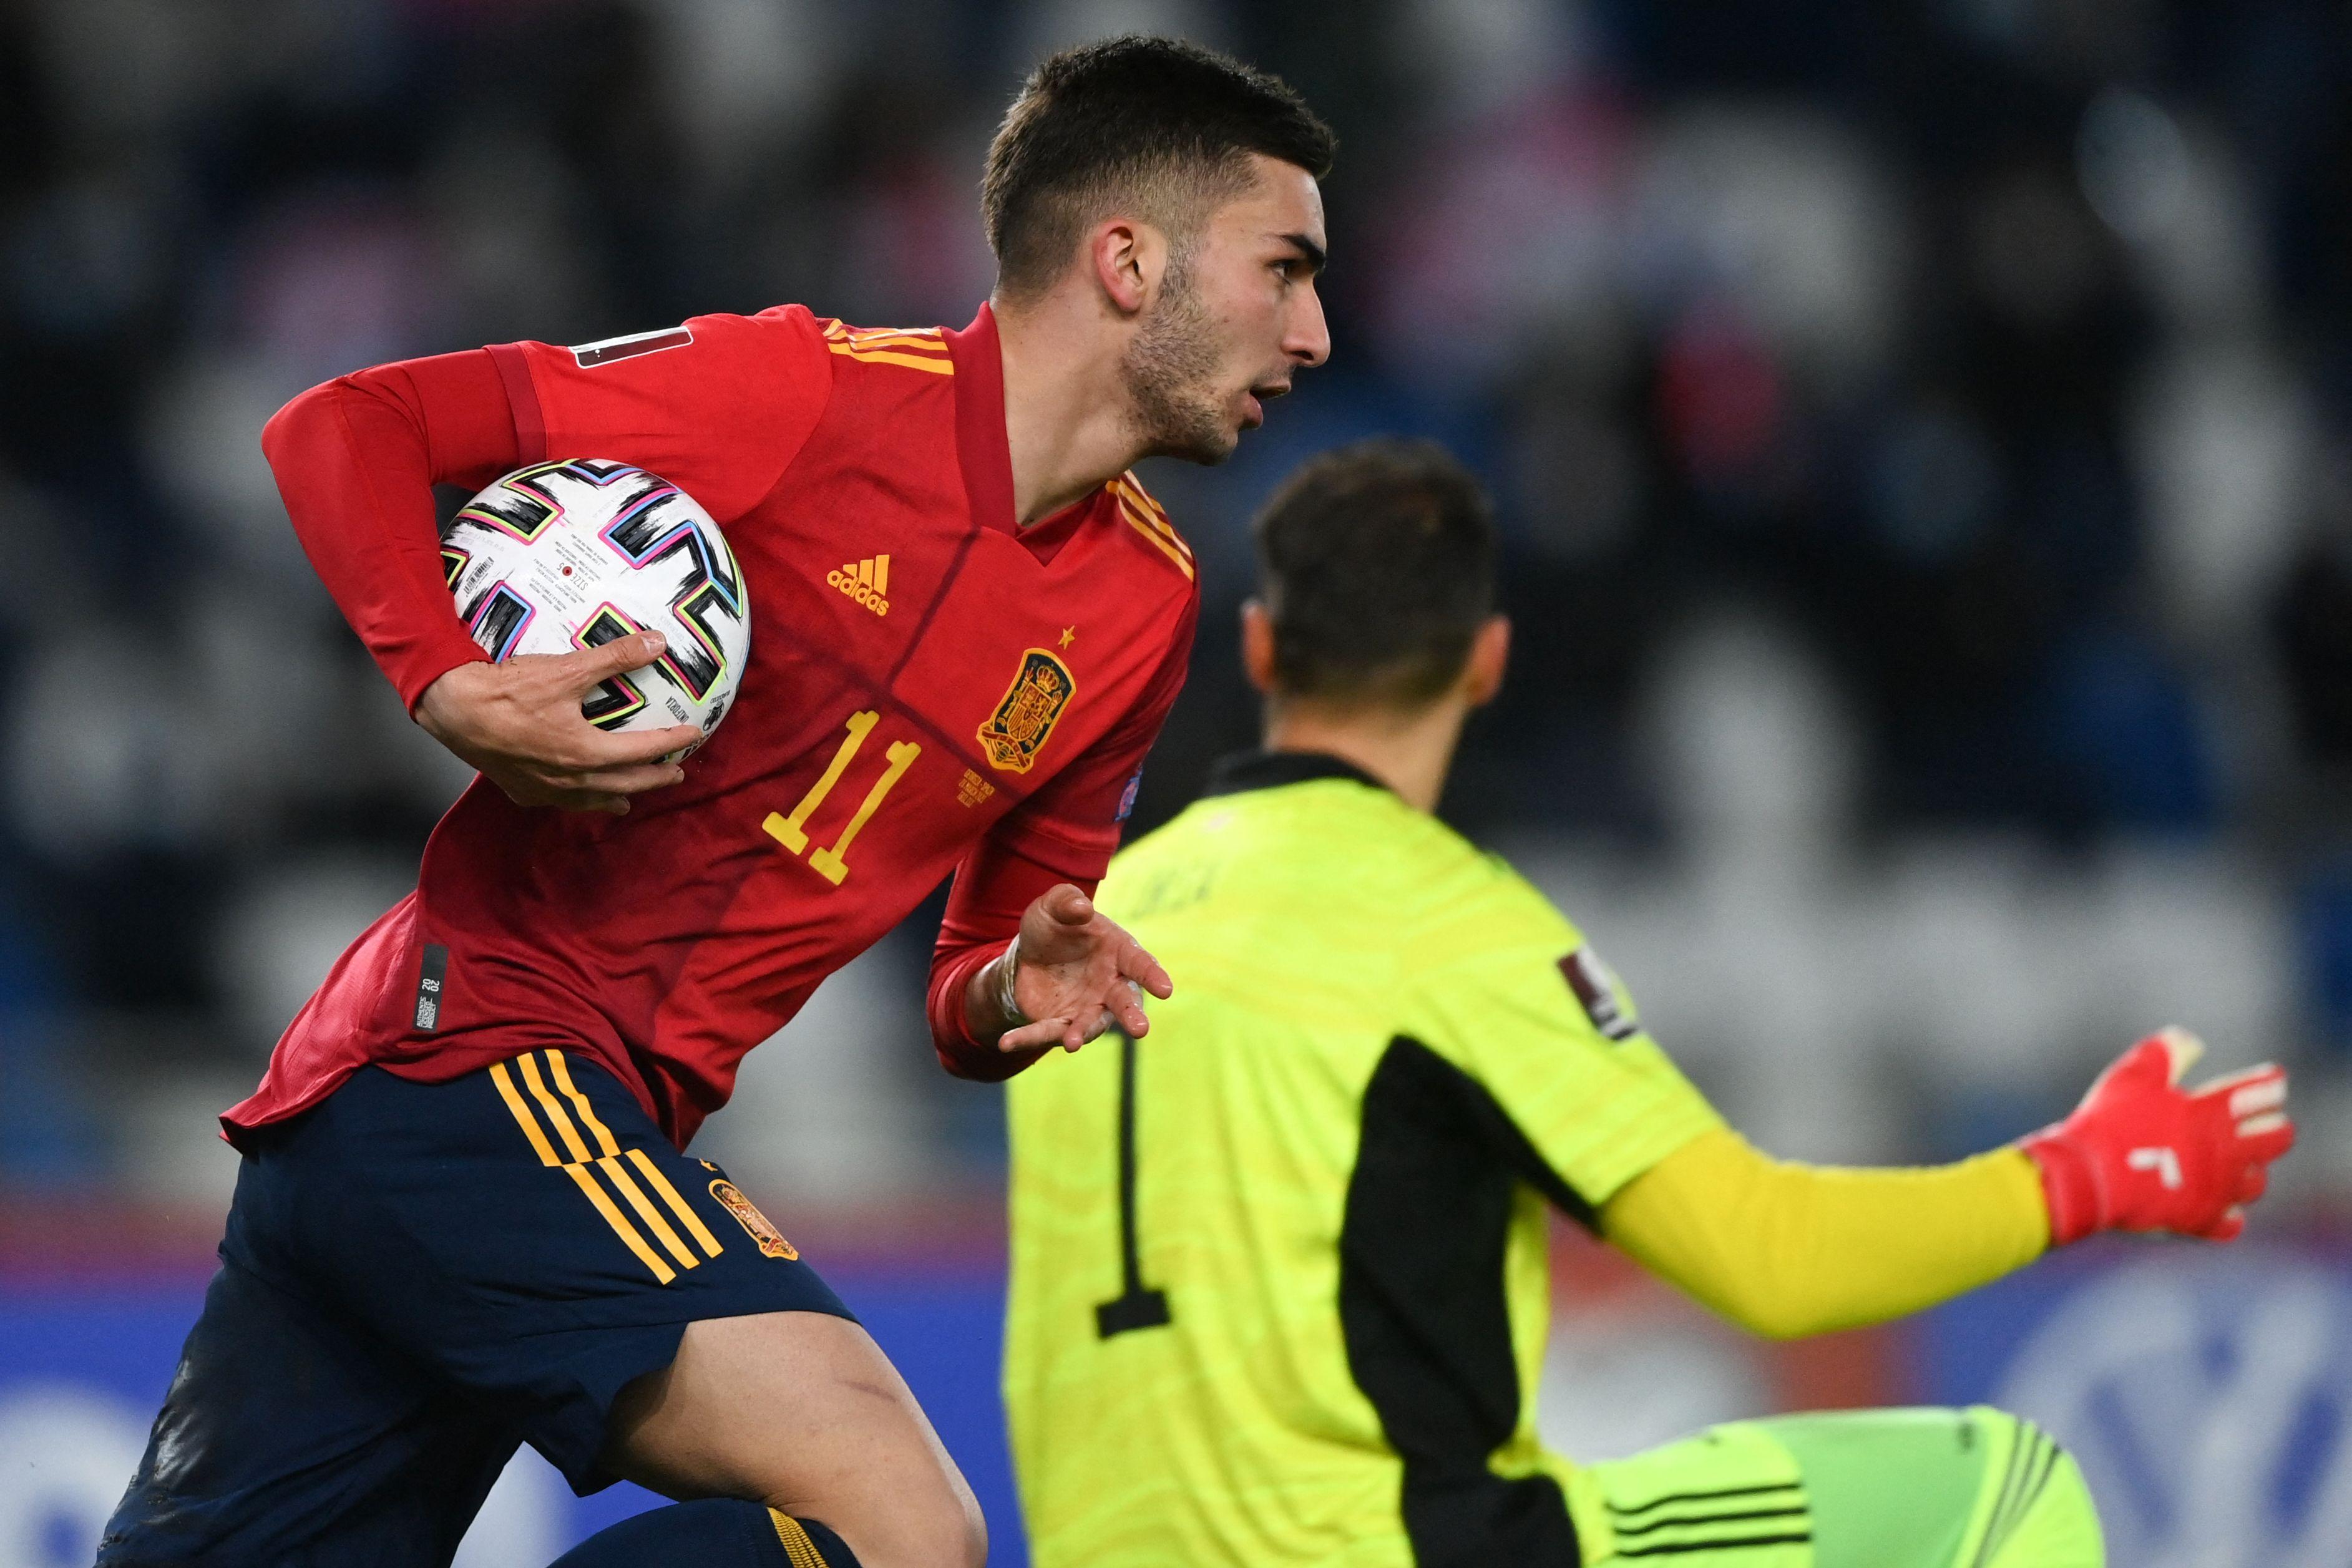 Spain star Ferran Torres fires warning shot after Georgia win - Football  Espana